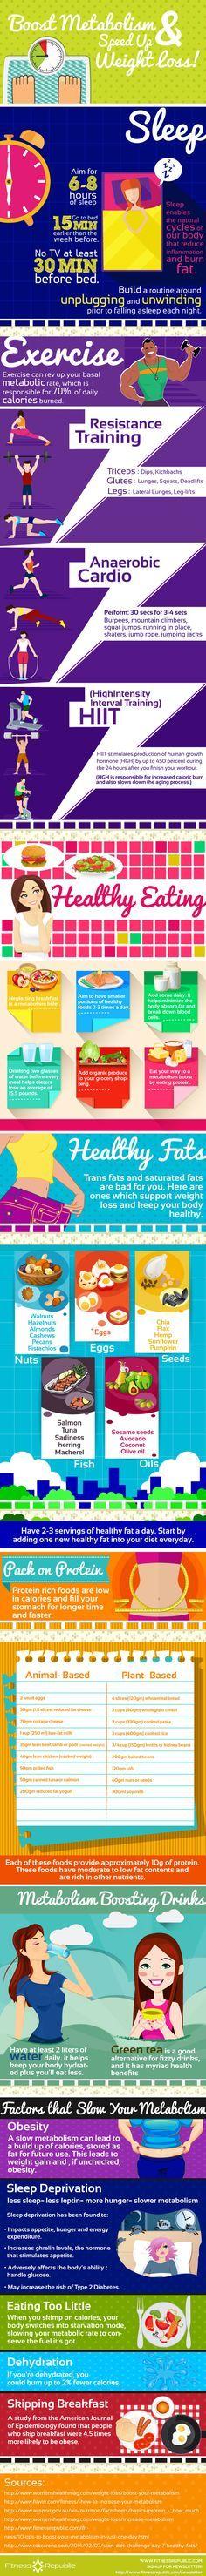 Estimula el metabolismo y acelera la perdida de grasa. Boost Metabolism and Speed Up Weight Loss! | Fitness Republic